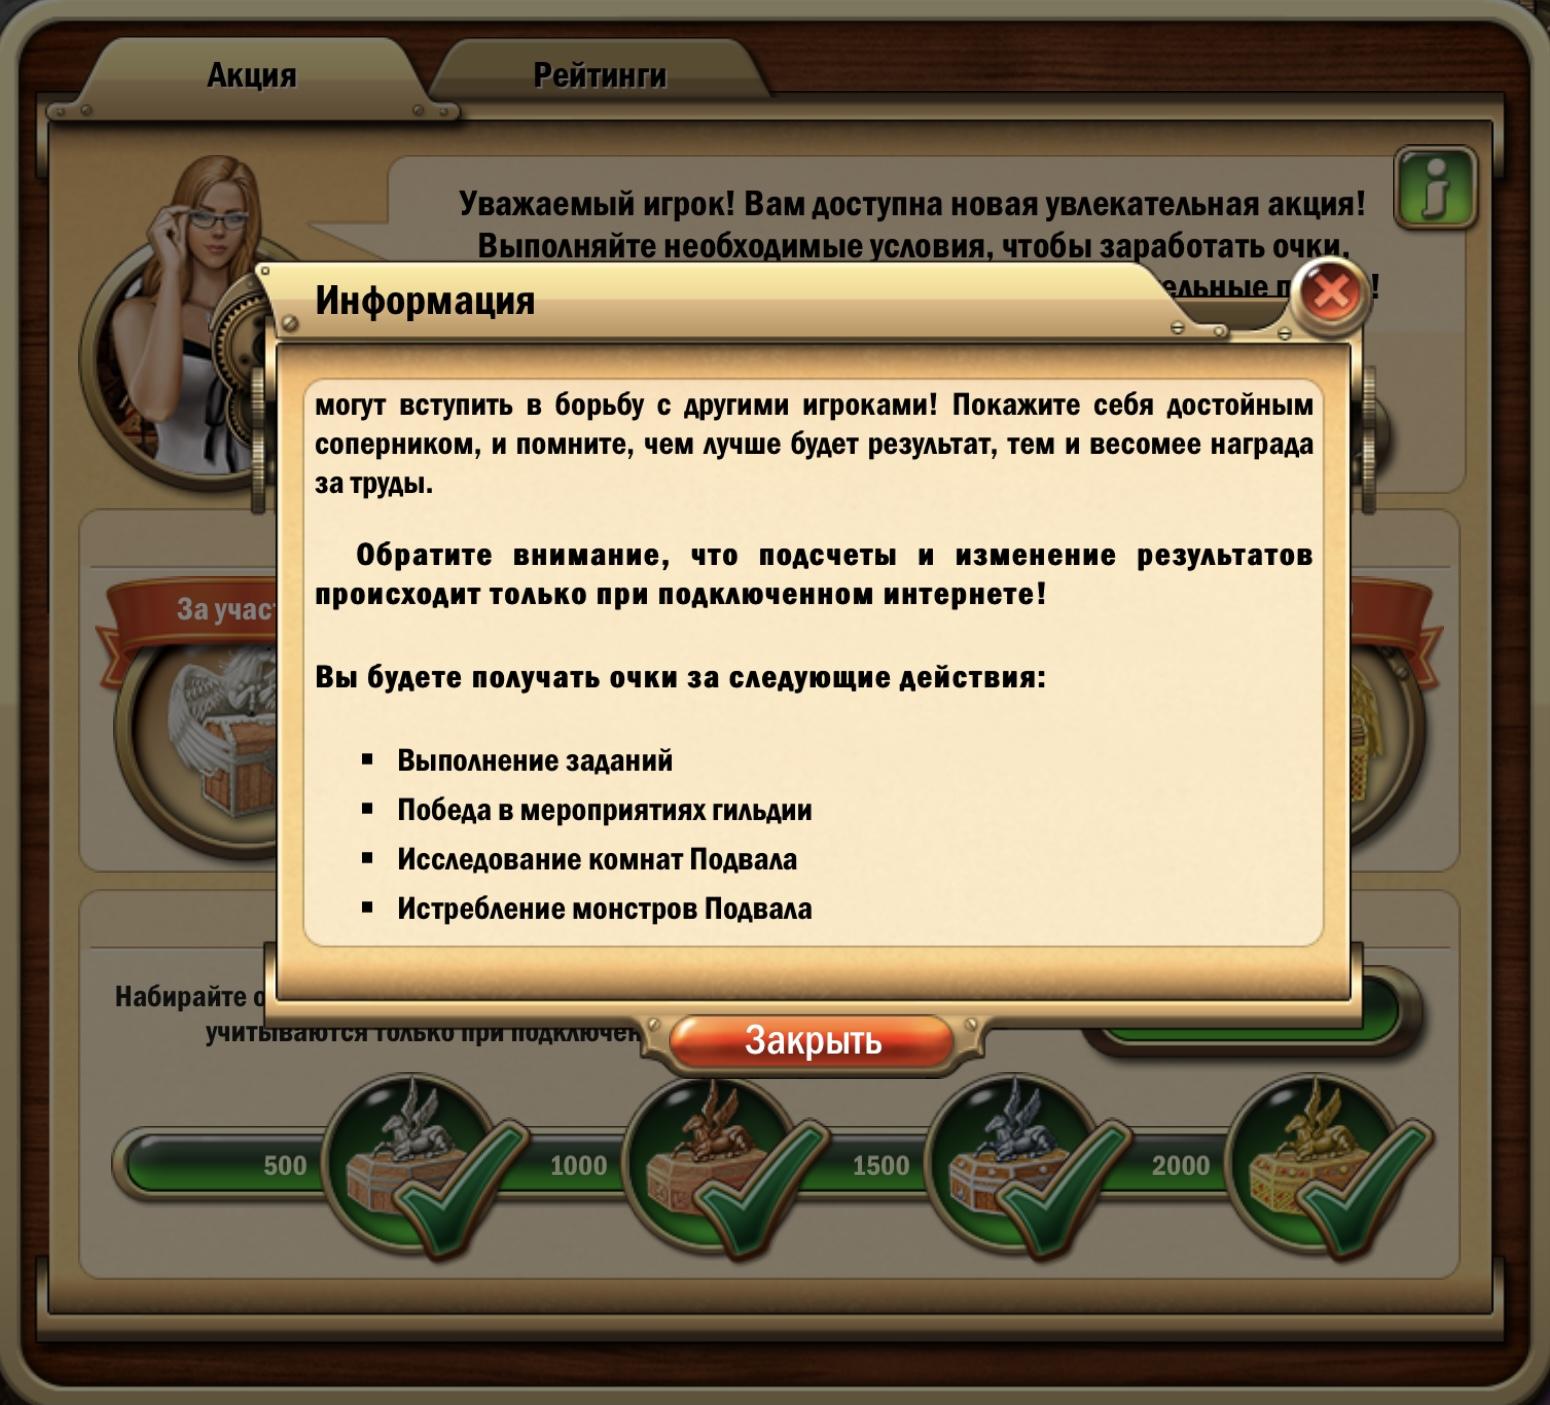 https://forumupload.ru/uploads/0019/3c/8c/3/488890.jpg